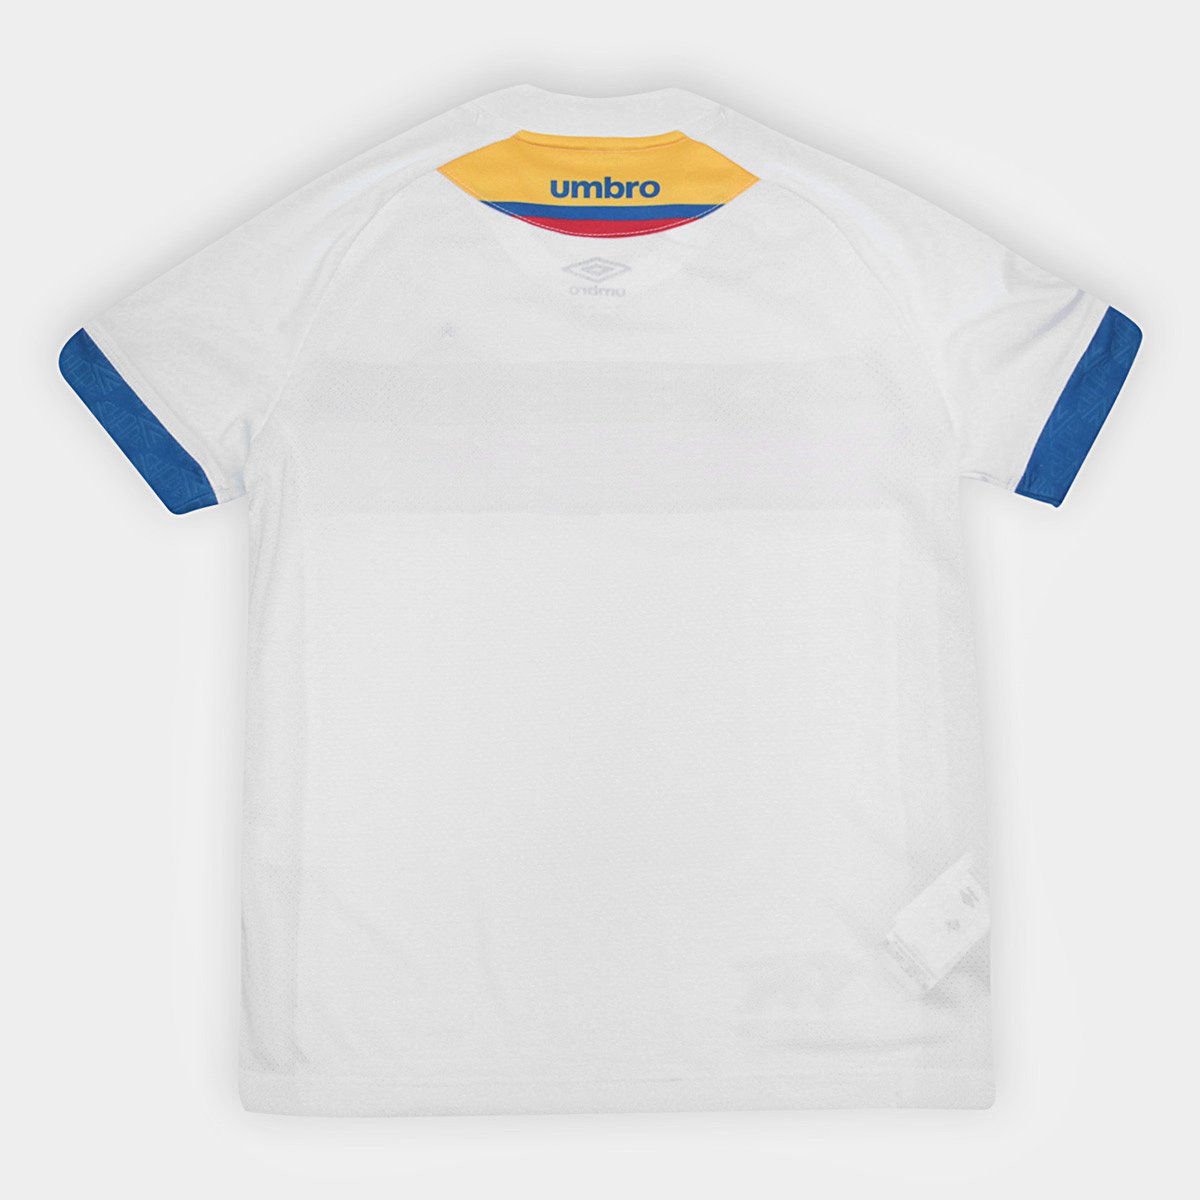 e Azul Chapecoense Branco La Infantil II 2018 Umbro s Camisa Pasion Torcedor n° Fdn7xPUn4w